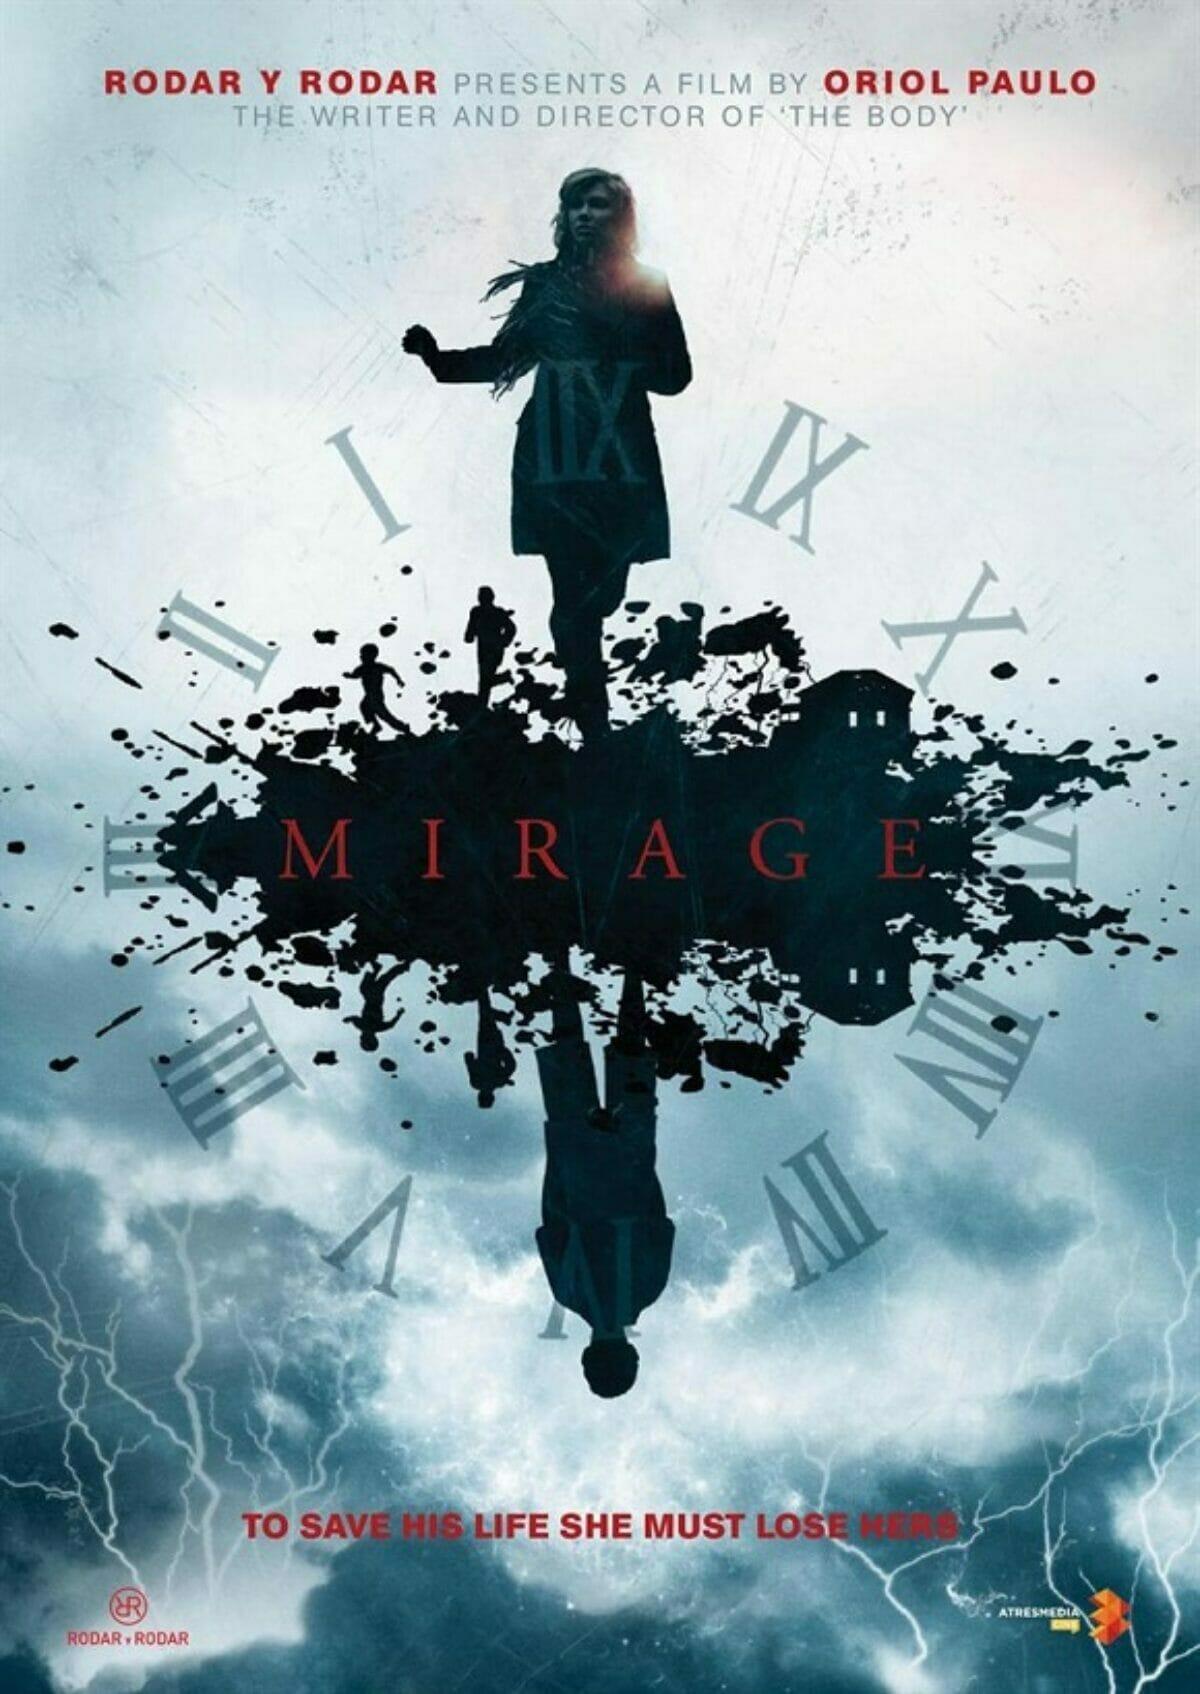 Mirage-Durante-la-tormenta-poster